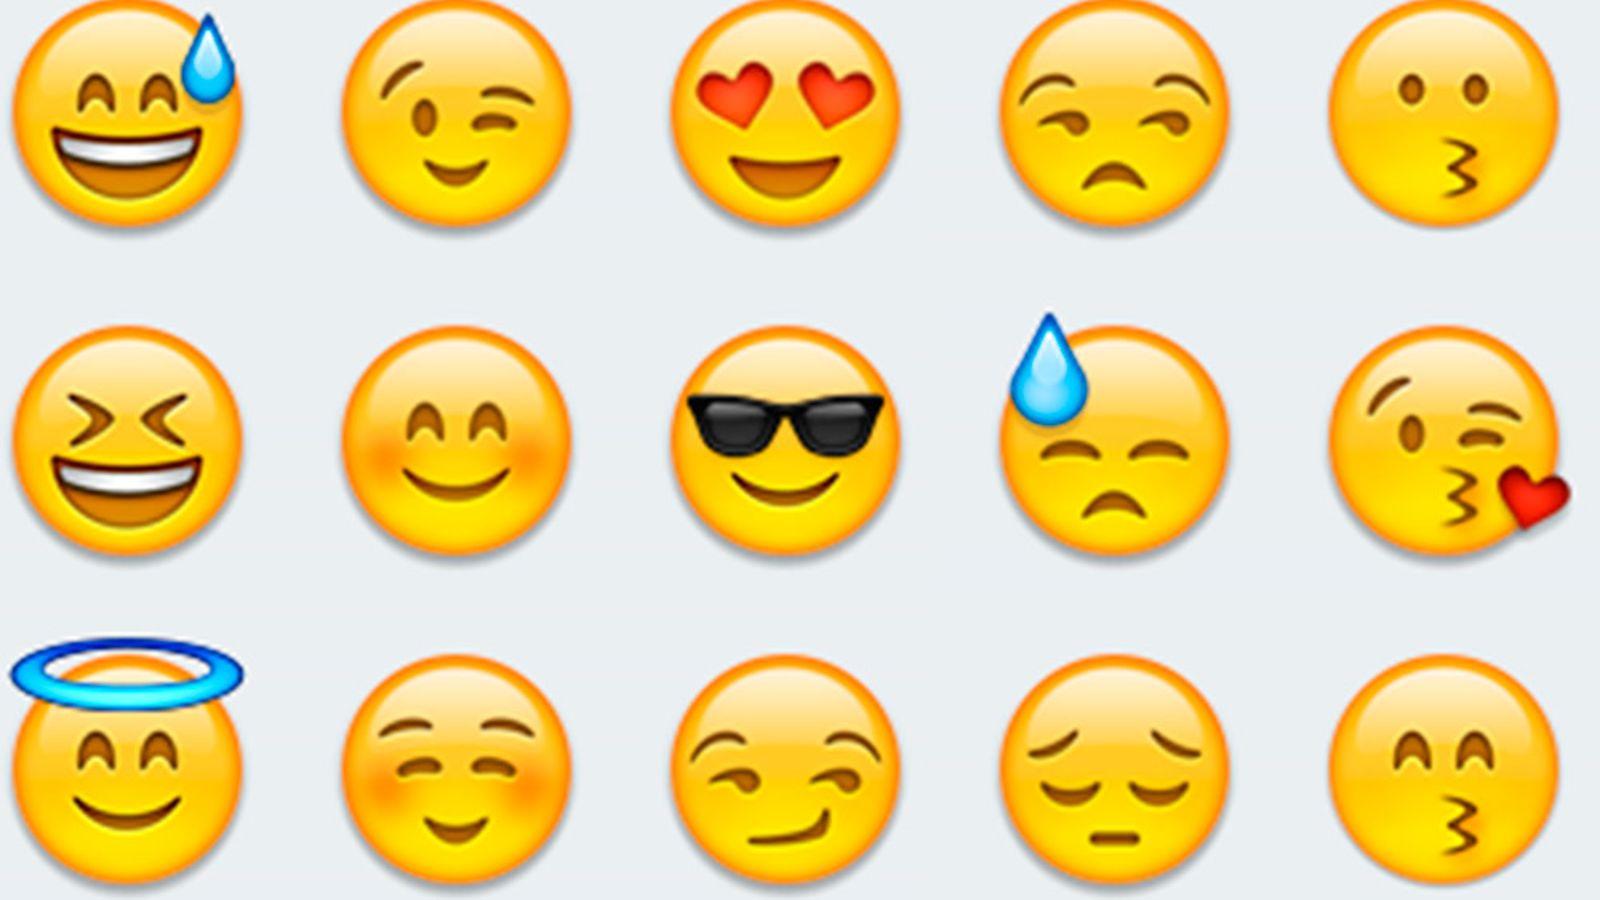 Make Your Own Iphone 5 Wallpaper Emoji Hd Emoji World